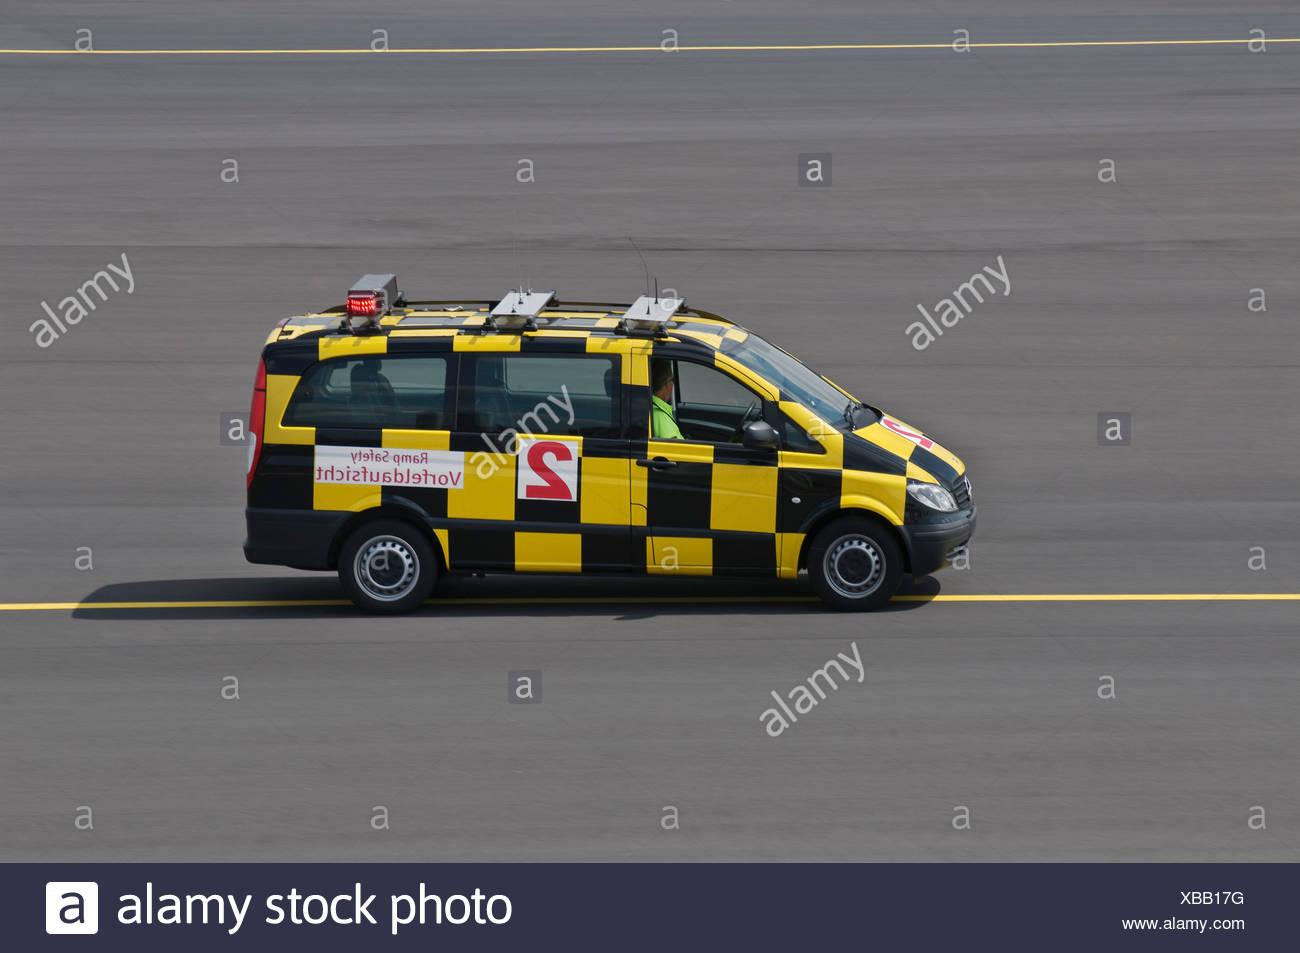 Vehicle of the airport authority, Duesseldorf International Airport, Duesseldorf, North Rhine-Westphalia, Germany, Europe - Stock Image